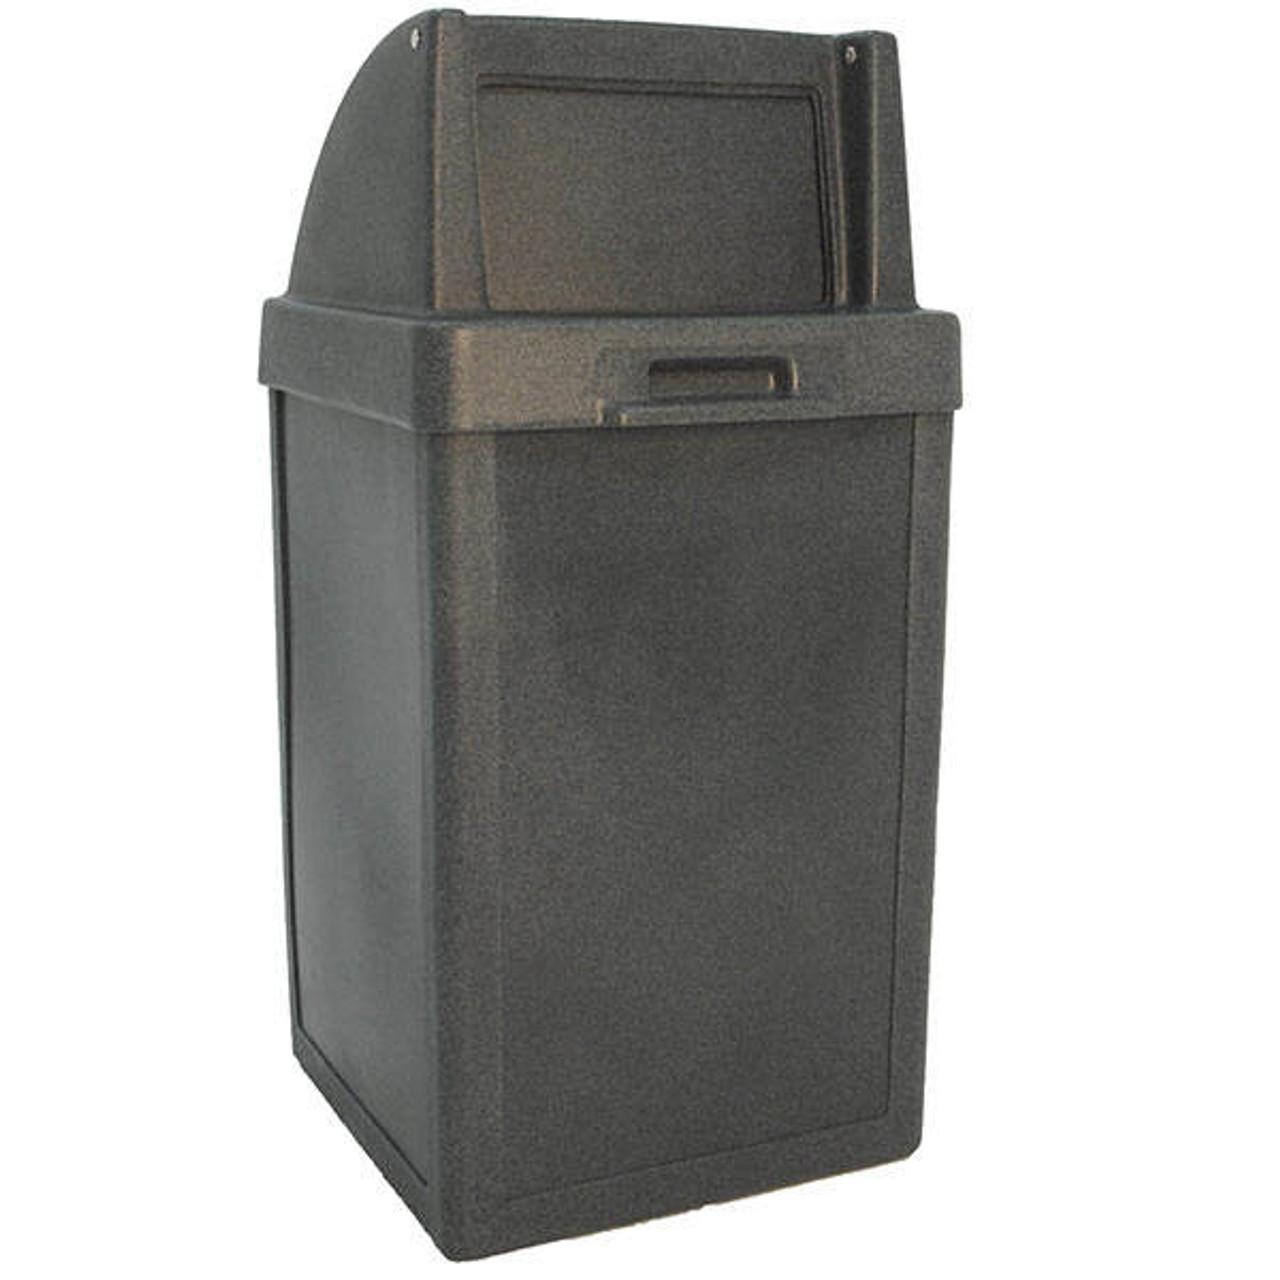 24 Gallon Heavy Duty Plastic Push Door Indoor Outdoor Trash Can TF1014